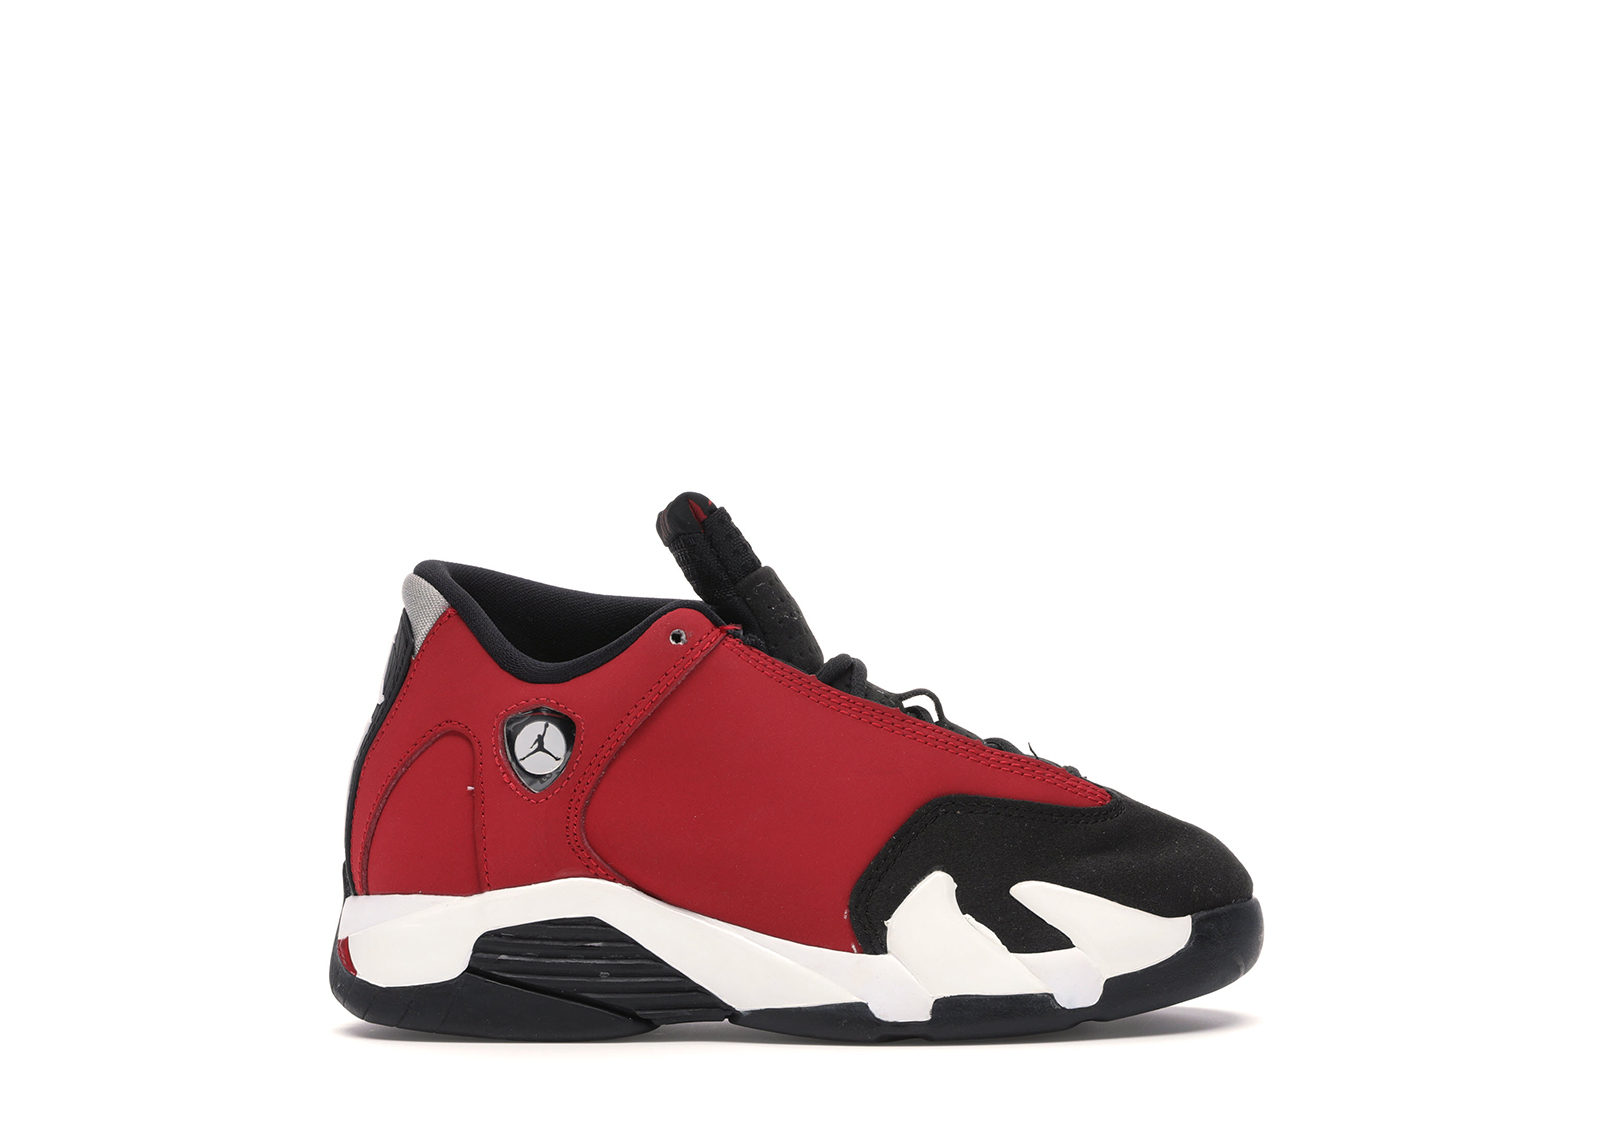 Jordan 14 Retro Gym Red Toro (PS